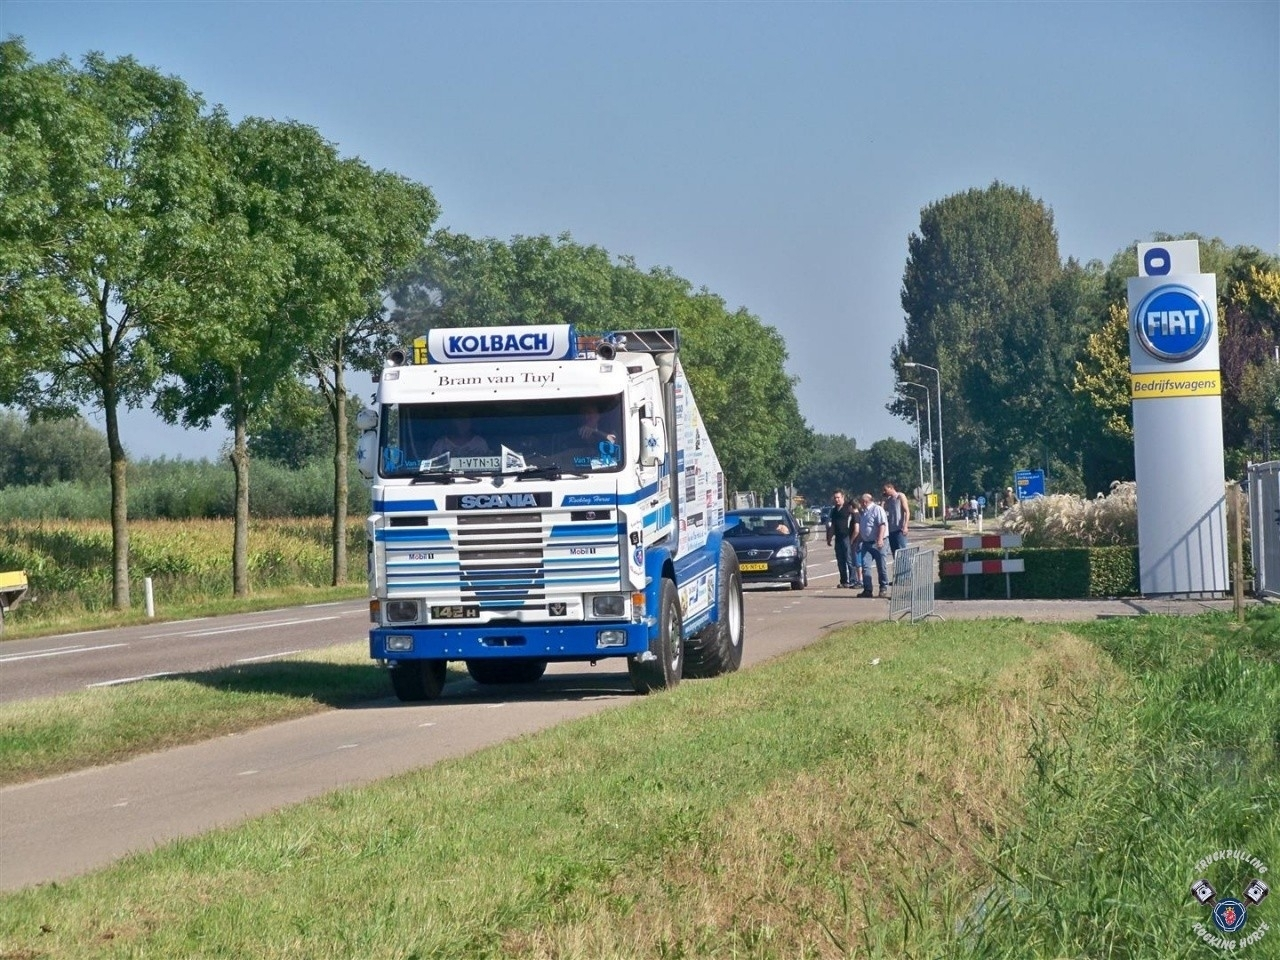 almkerk-2012-013